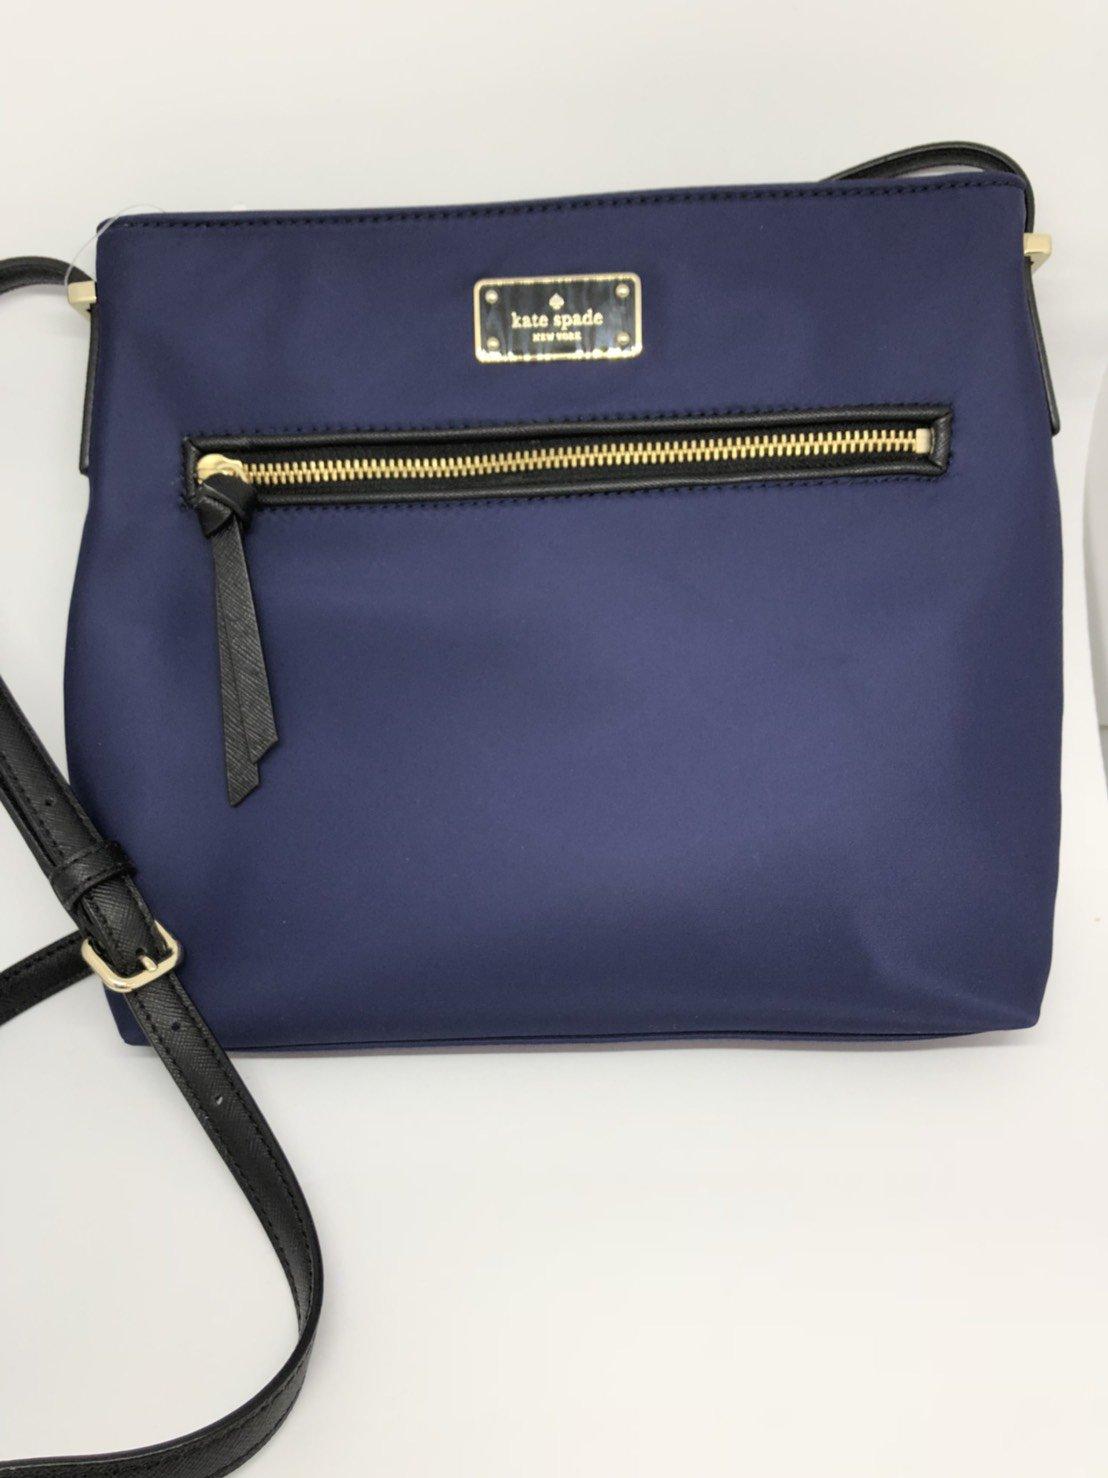 Kate Spade Wilson Road Nylon Dessi Nylon Crossbody Handbag (French Navy)